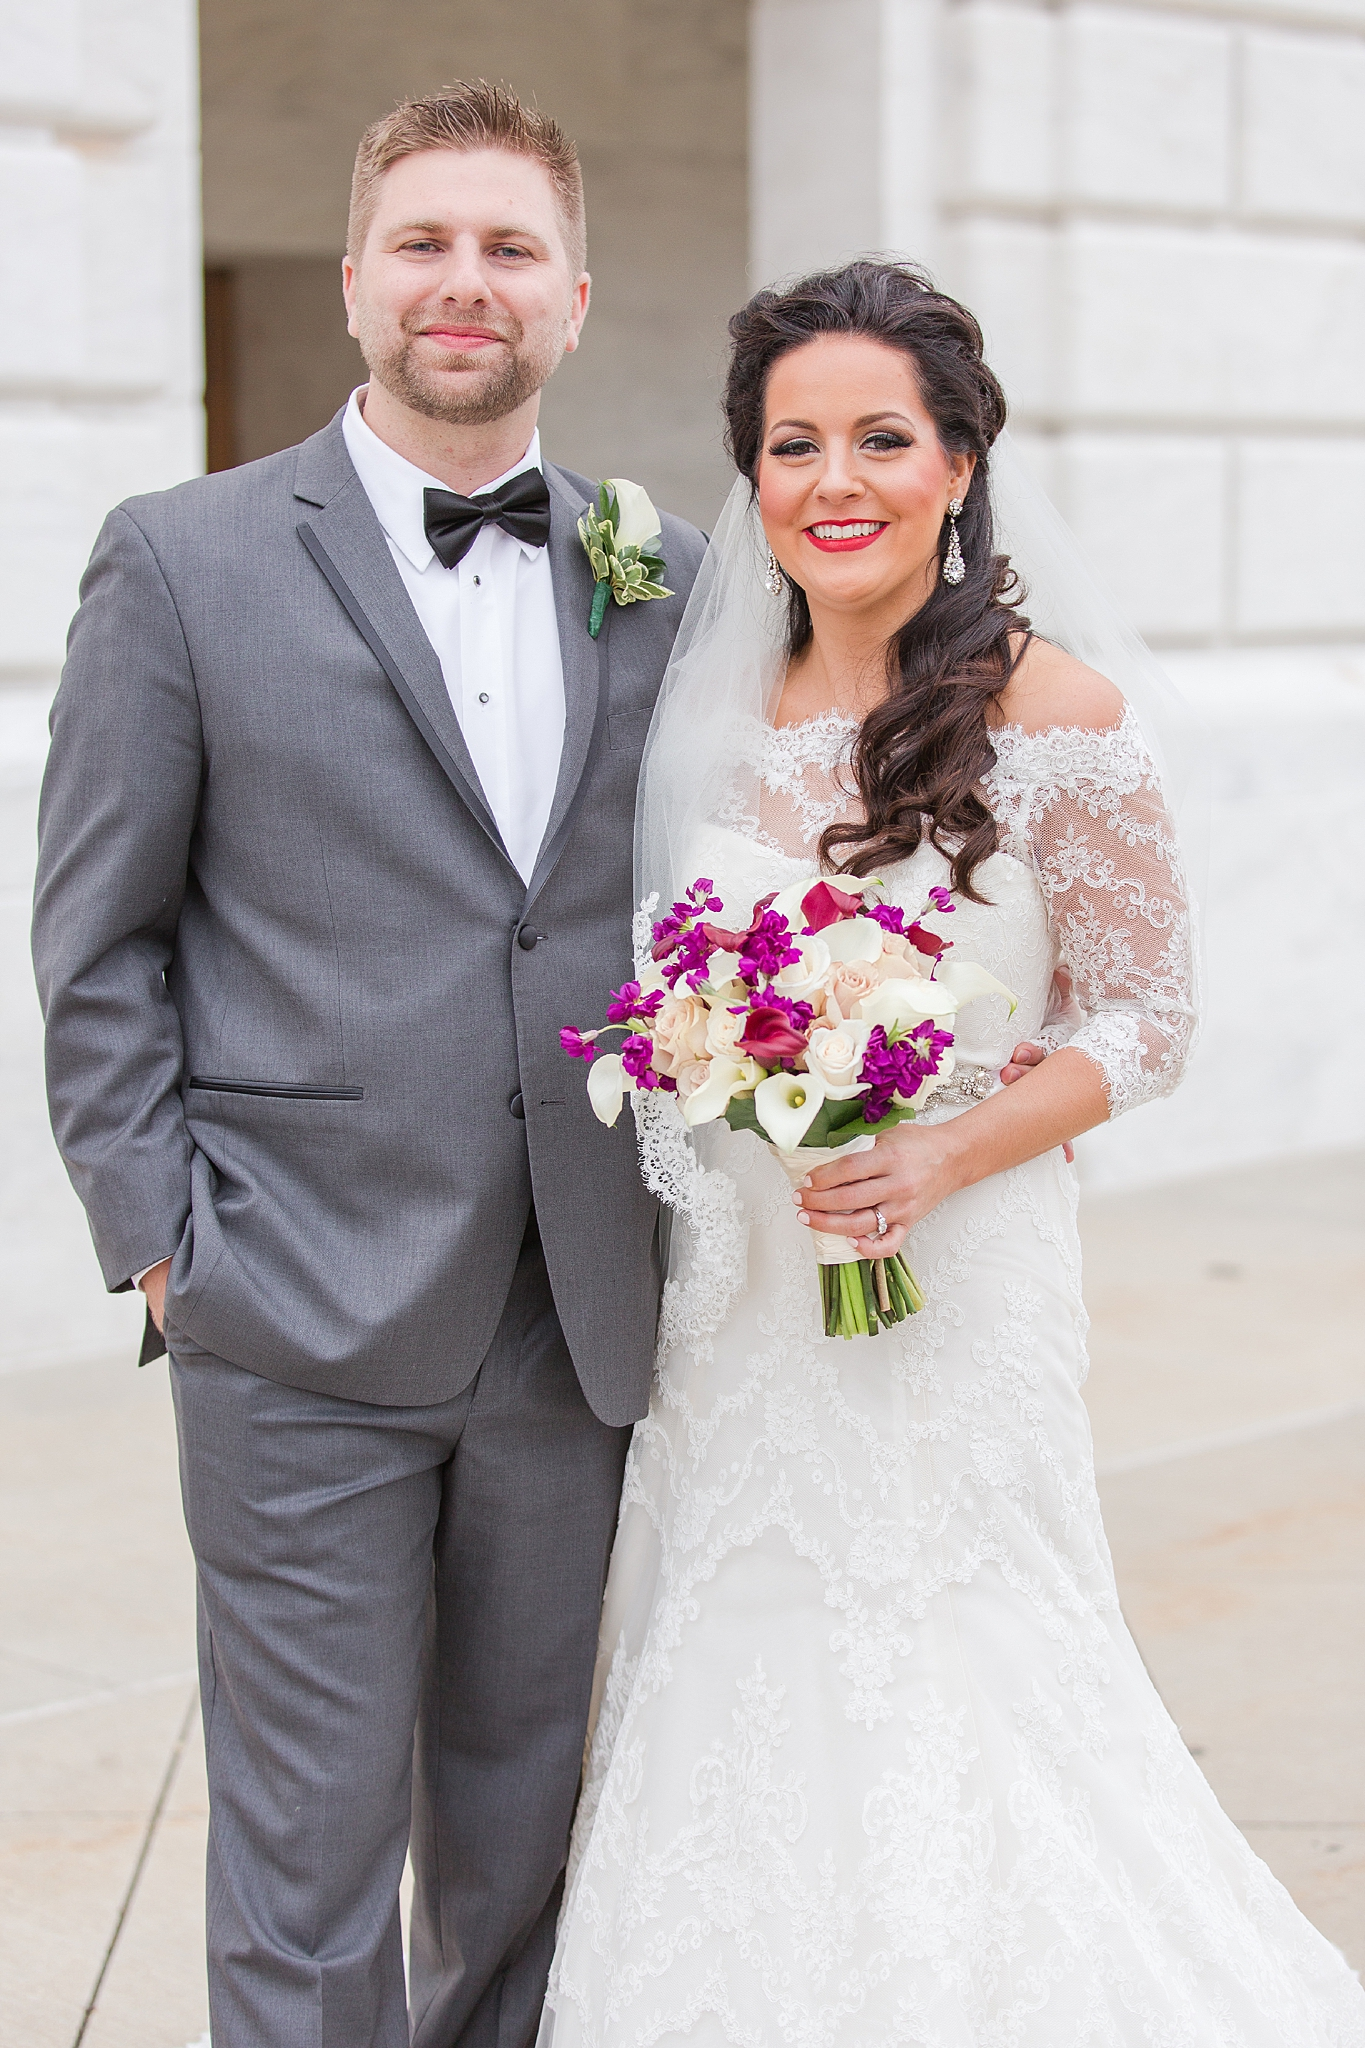 detroit-colony-club-wedding-regal-romantic-photography-in-detroit-mi-by-courtney-carolyn-photography_0014.jpg